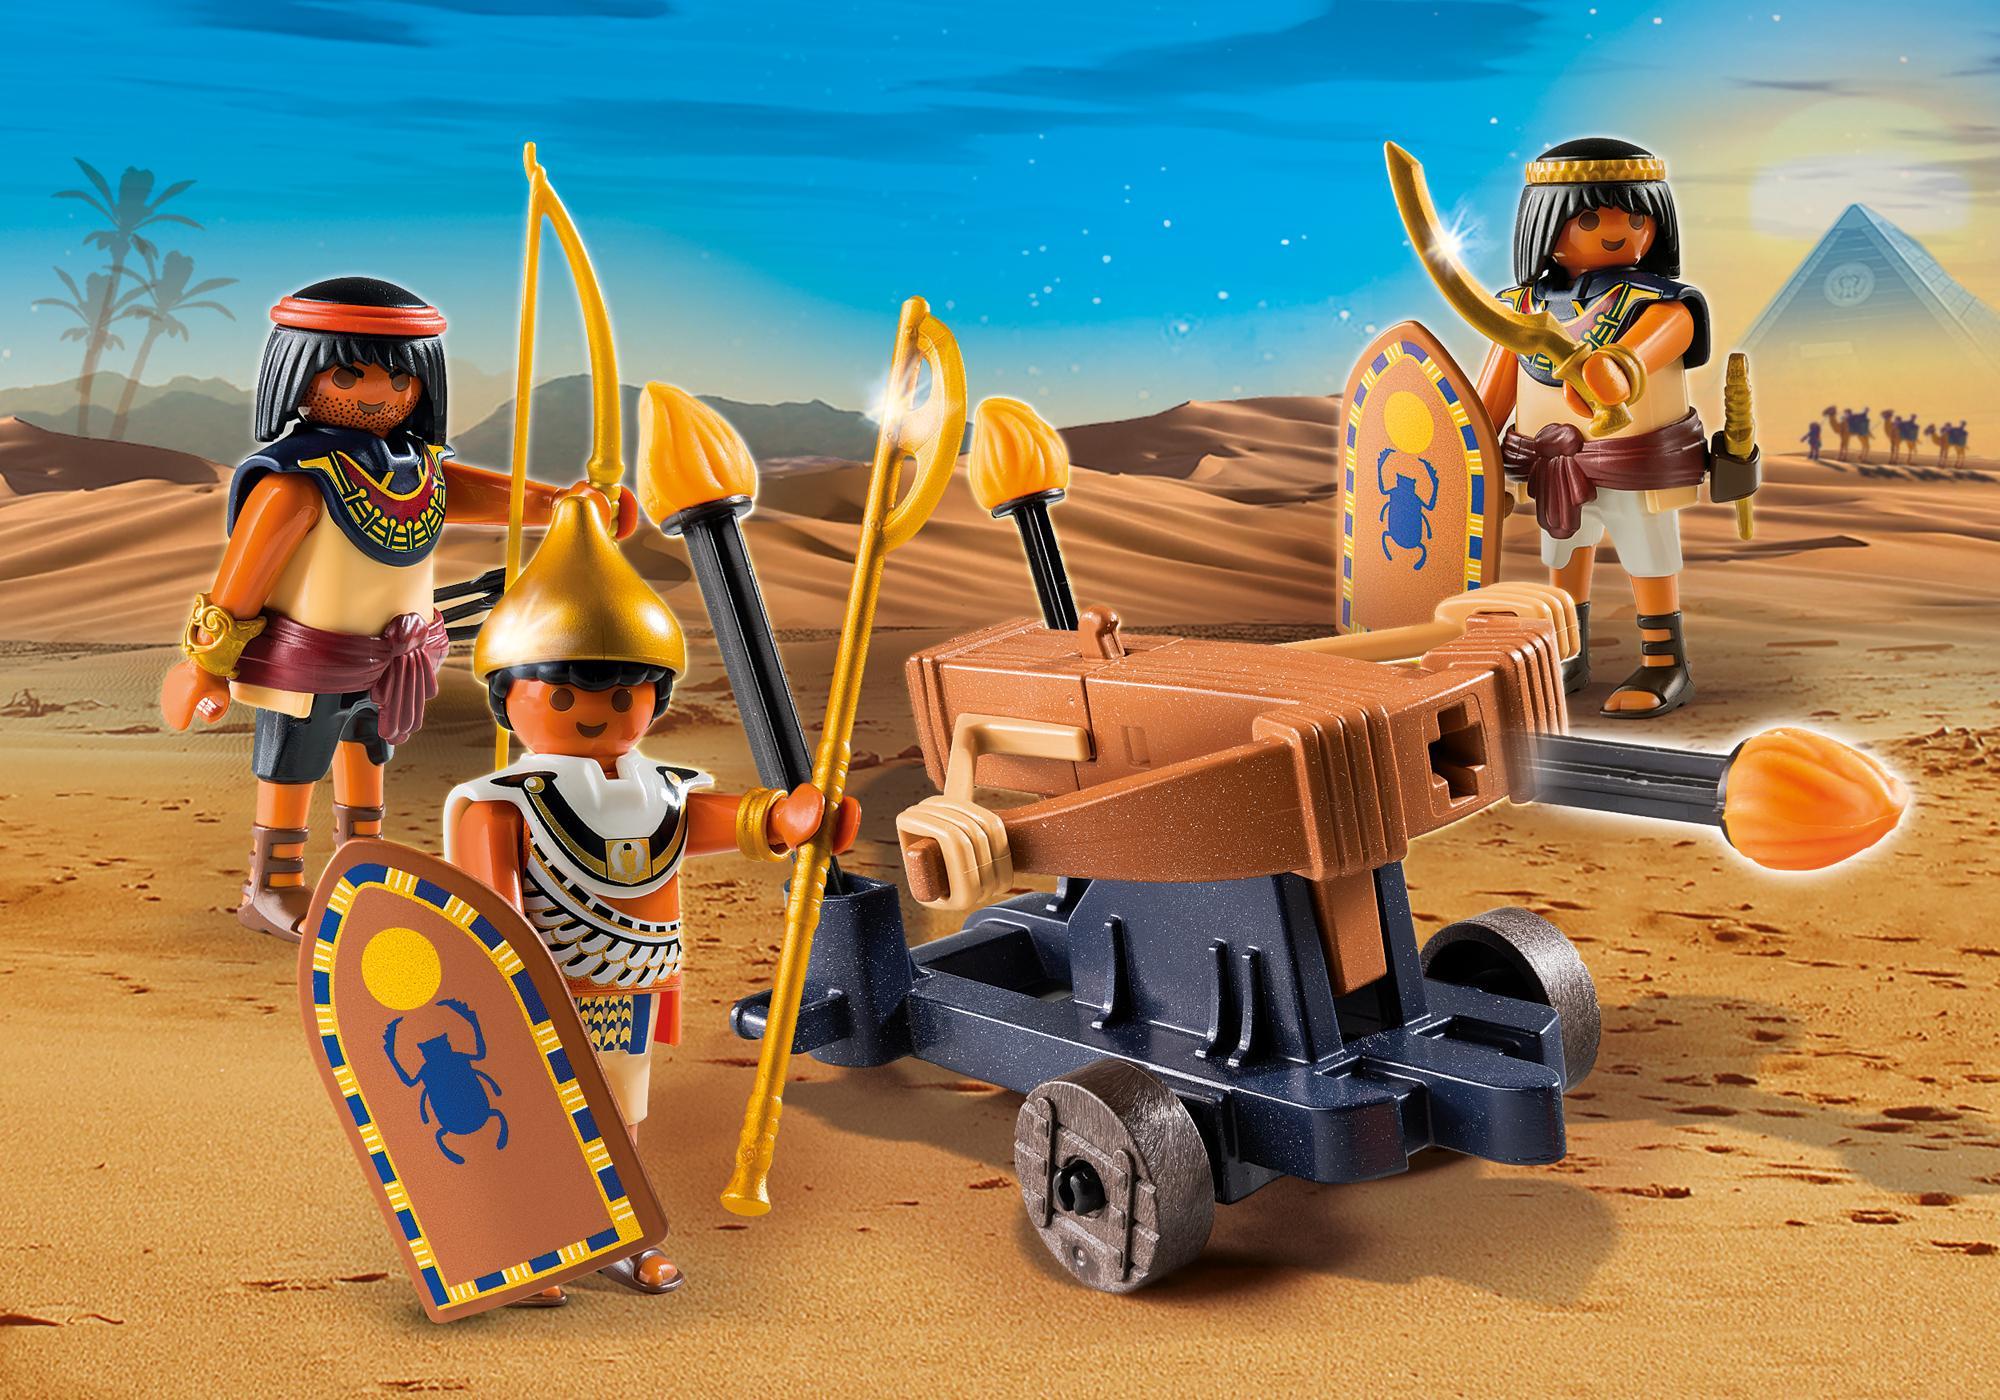 http://media.playmobil.com/i/playmobil/5388_product_detail/Римляне и Египтяне: Египетский солдат с Баллистой